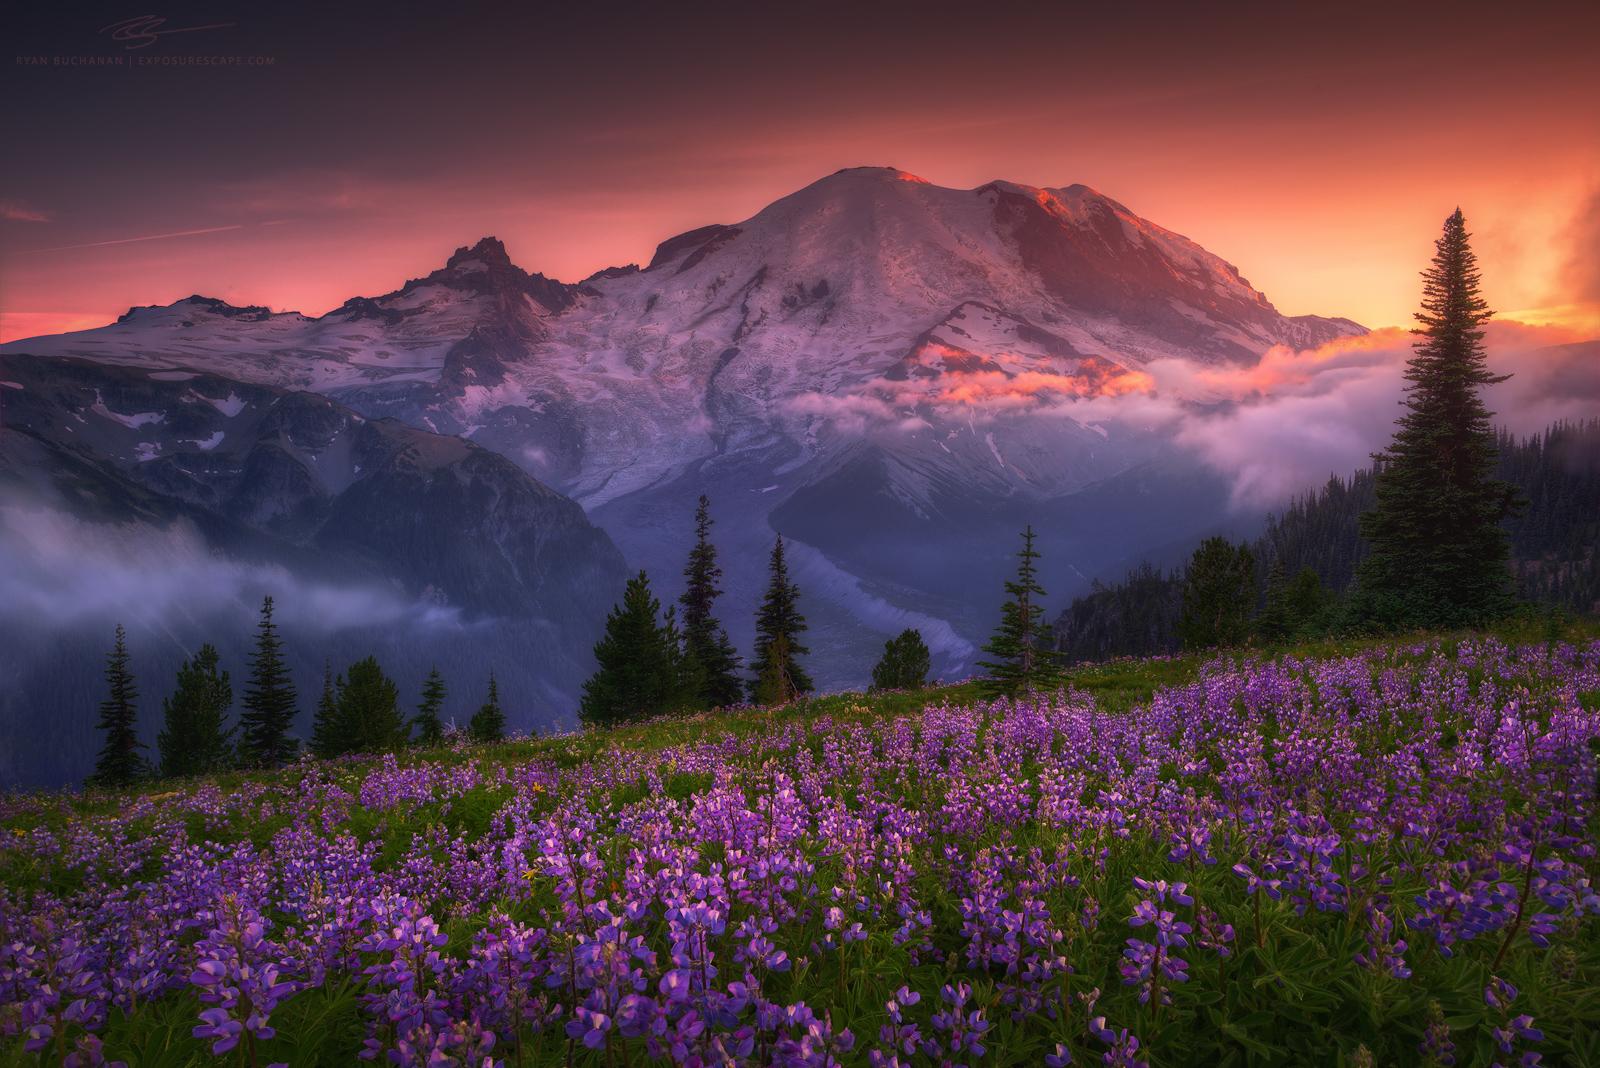 Sunrise, Mount Rainier at sunset during peak flower bloom